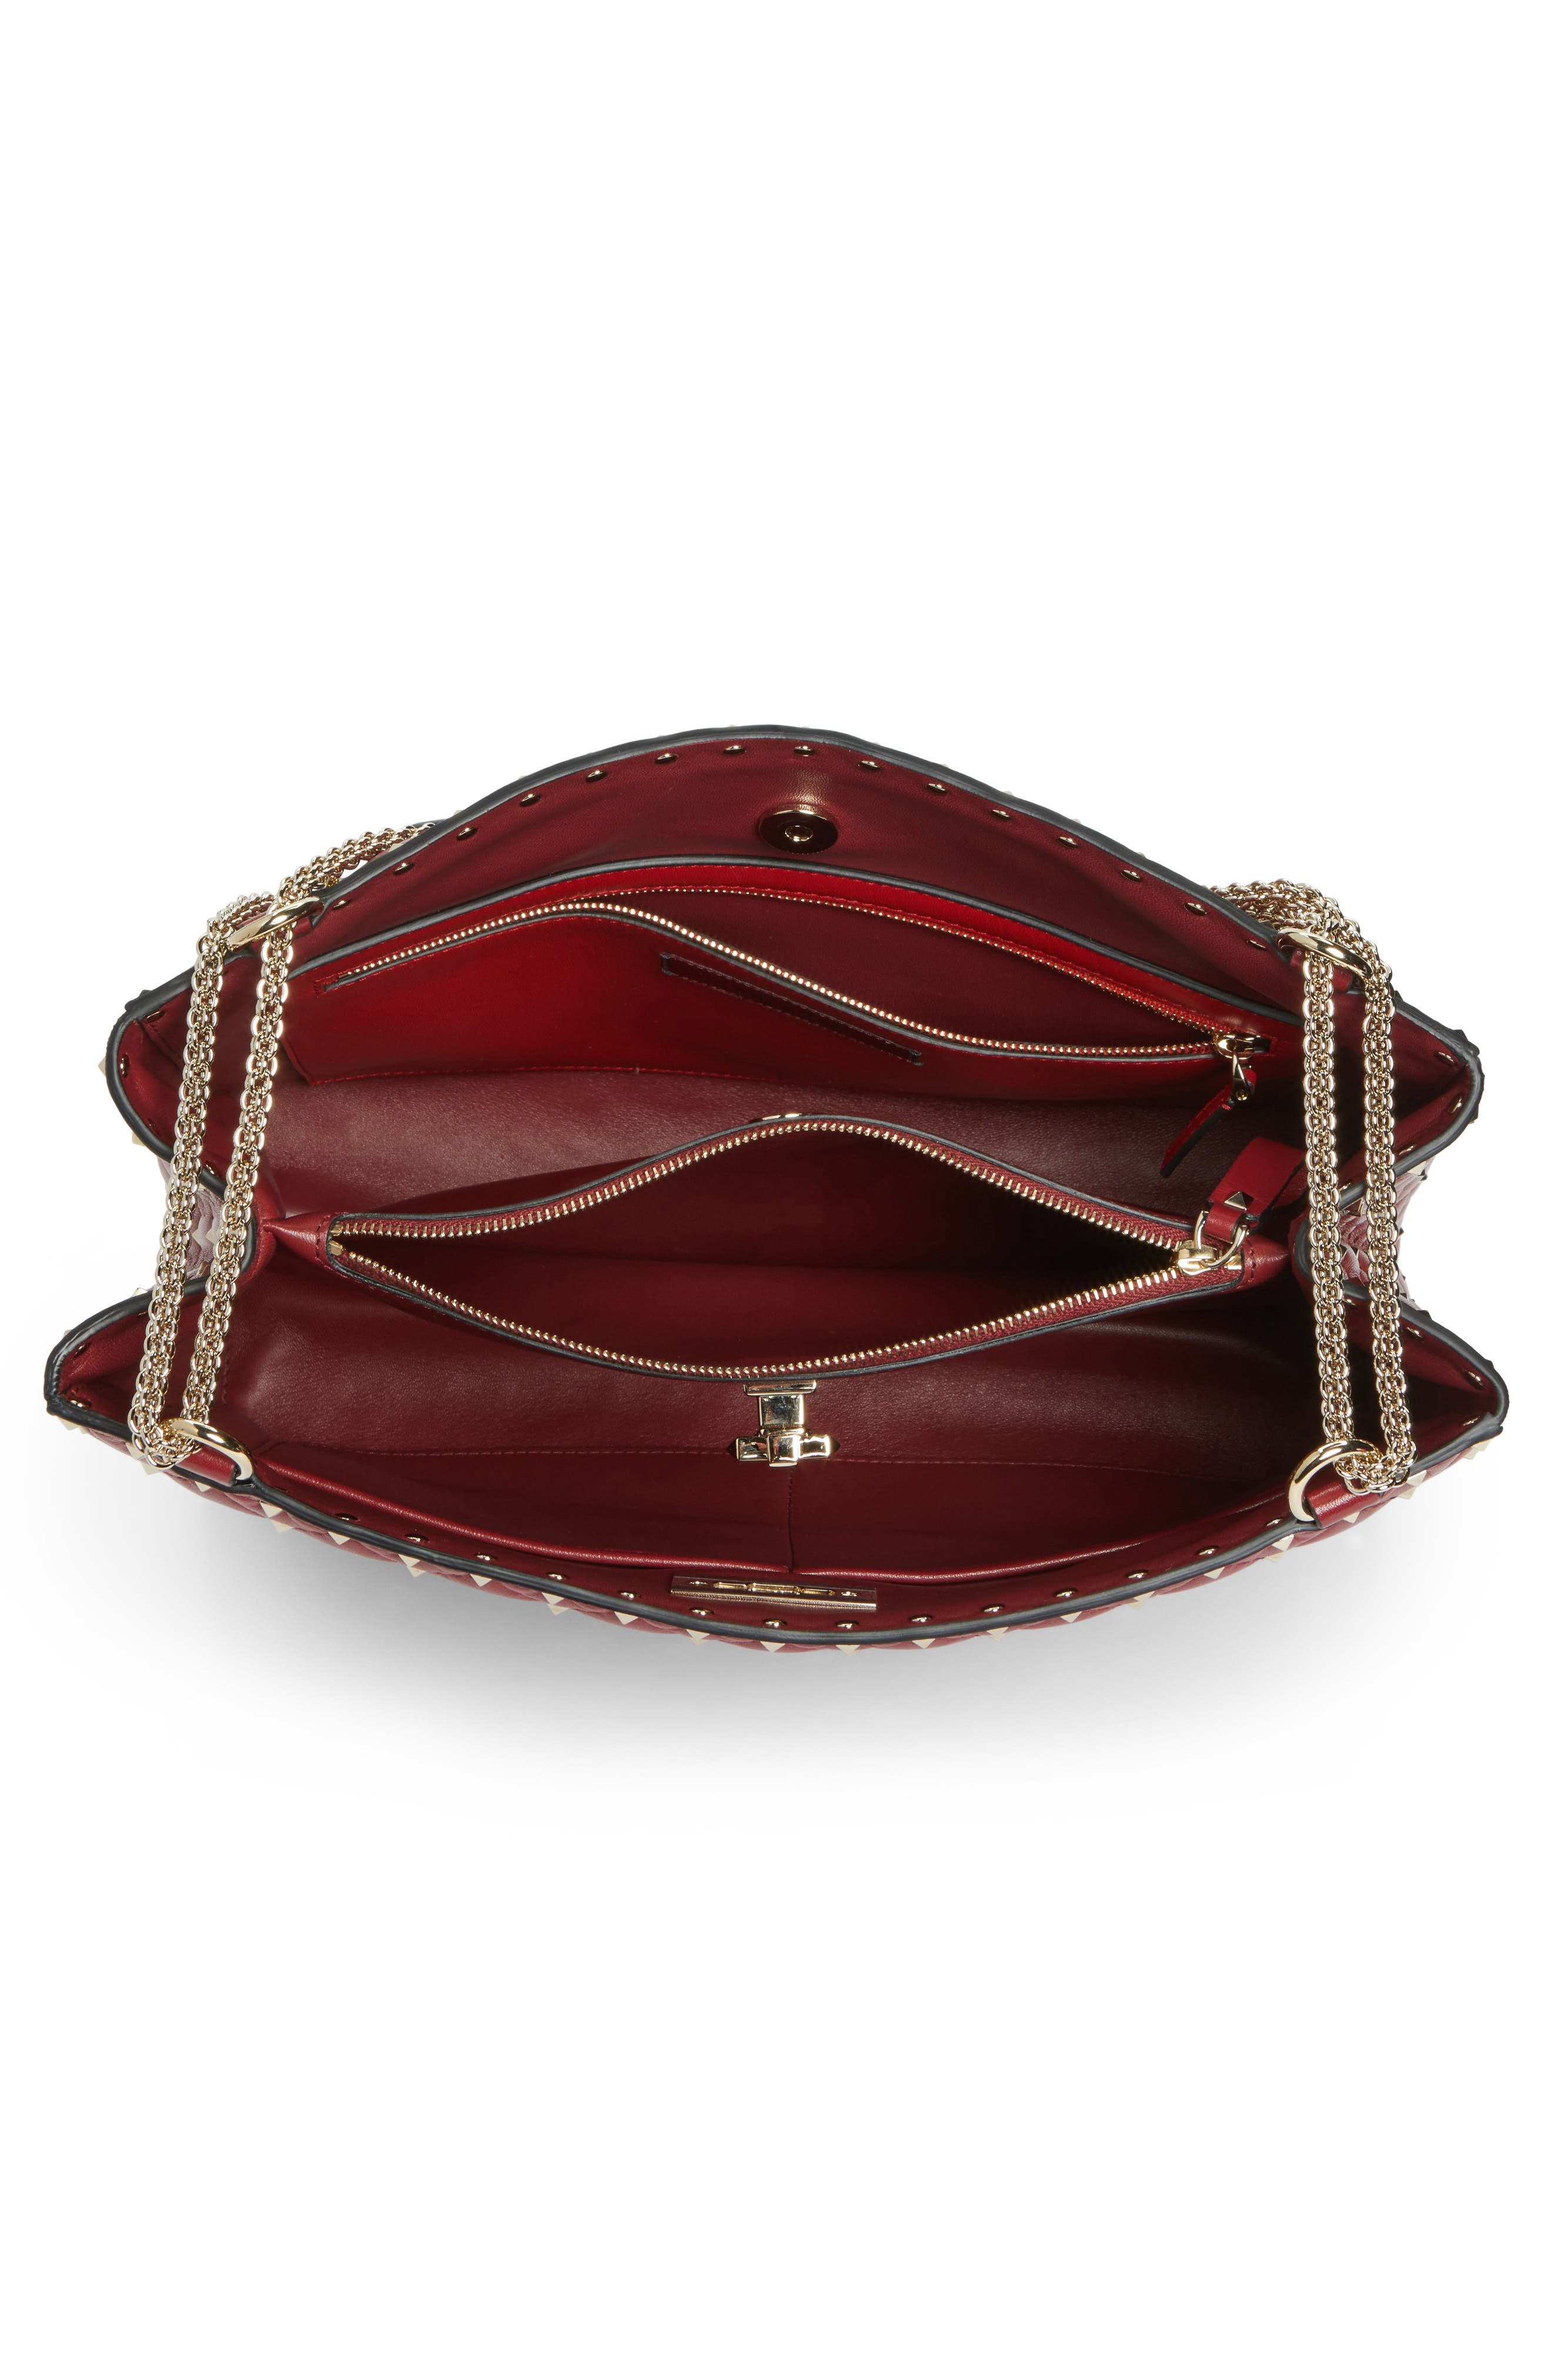 Rockstud Spike Quilted Lambskin Leather Shoulder Bag,                             Alternate thumbnail 4, color,                             ROSSO